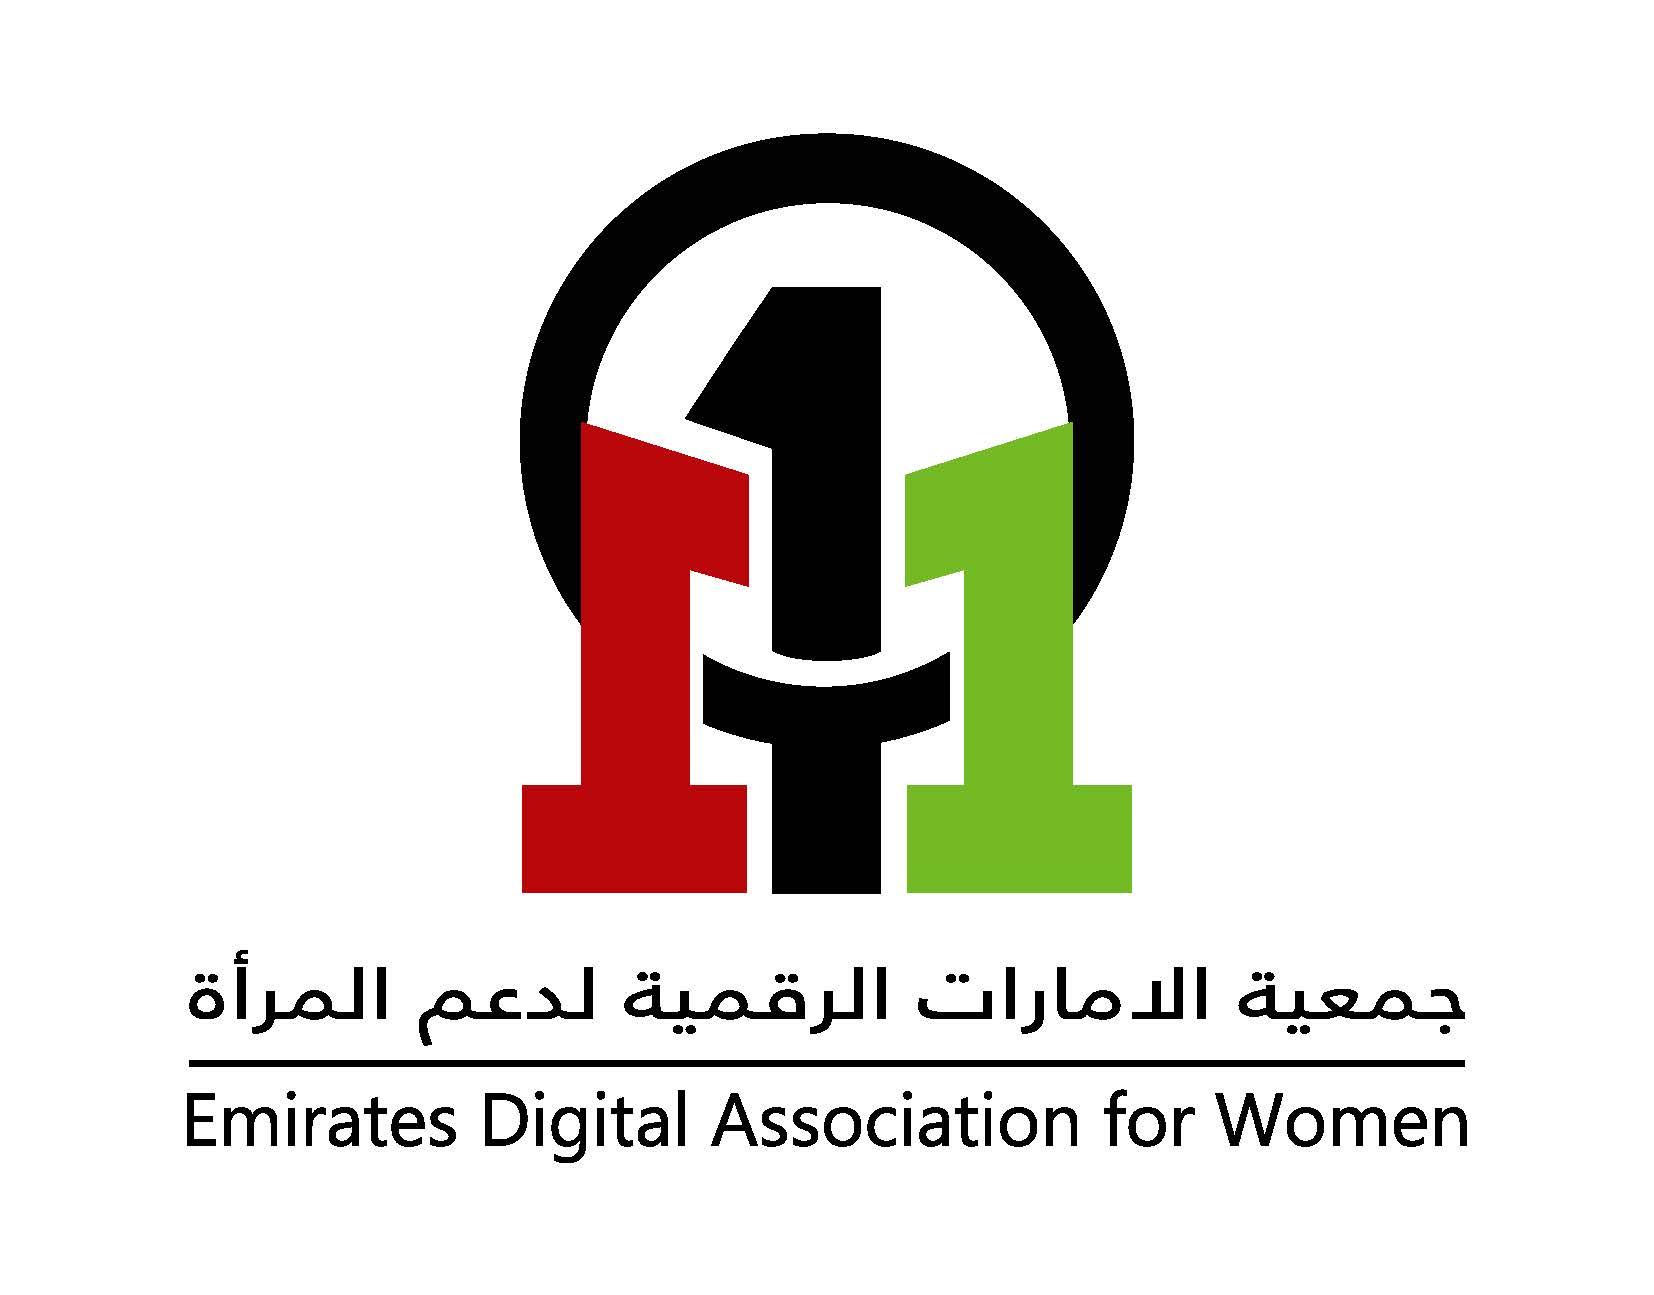 Emirates Digital Association for Women